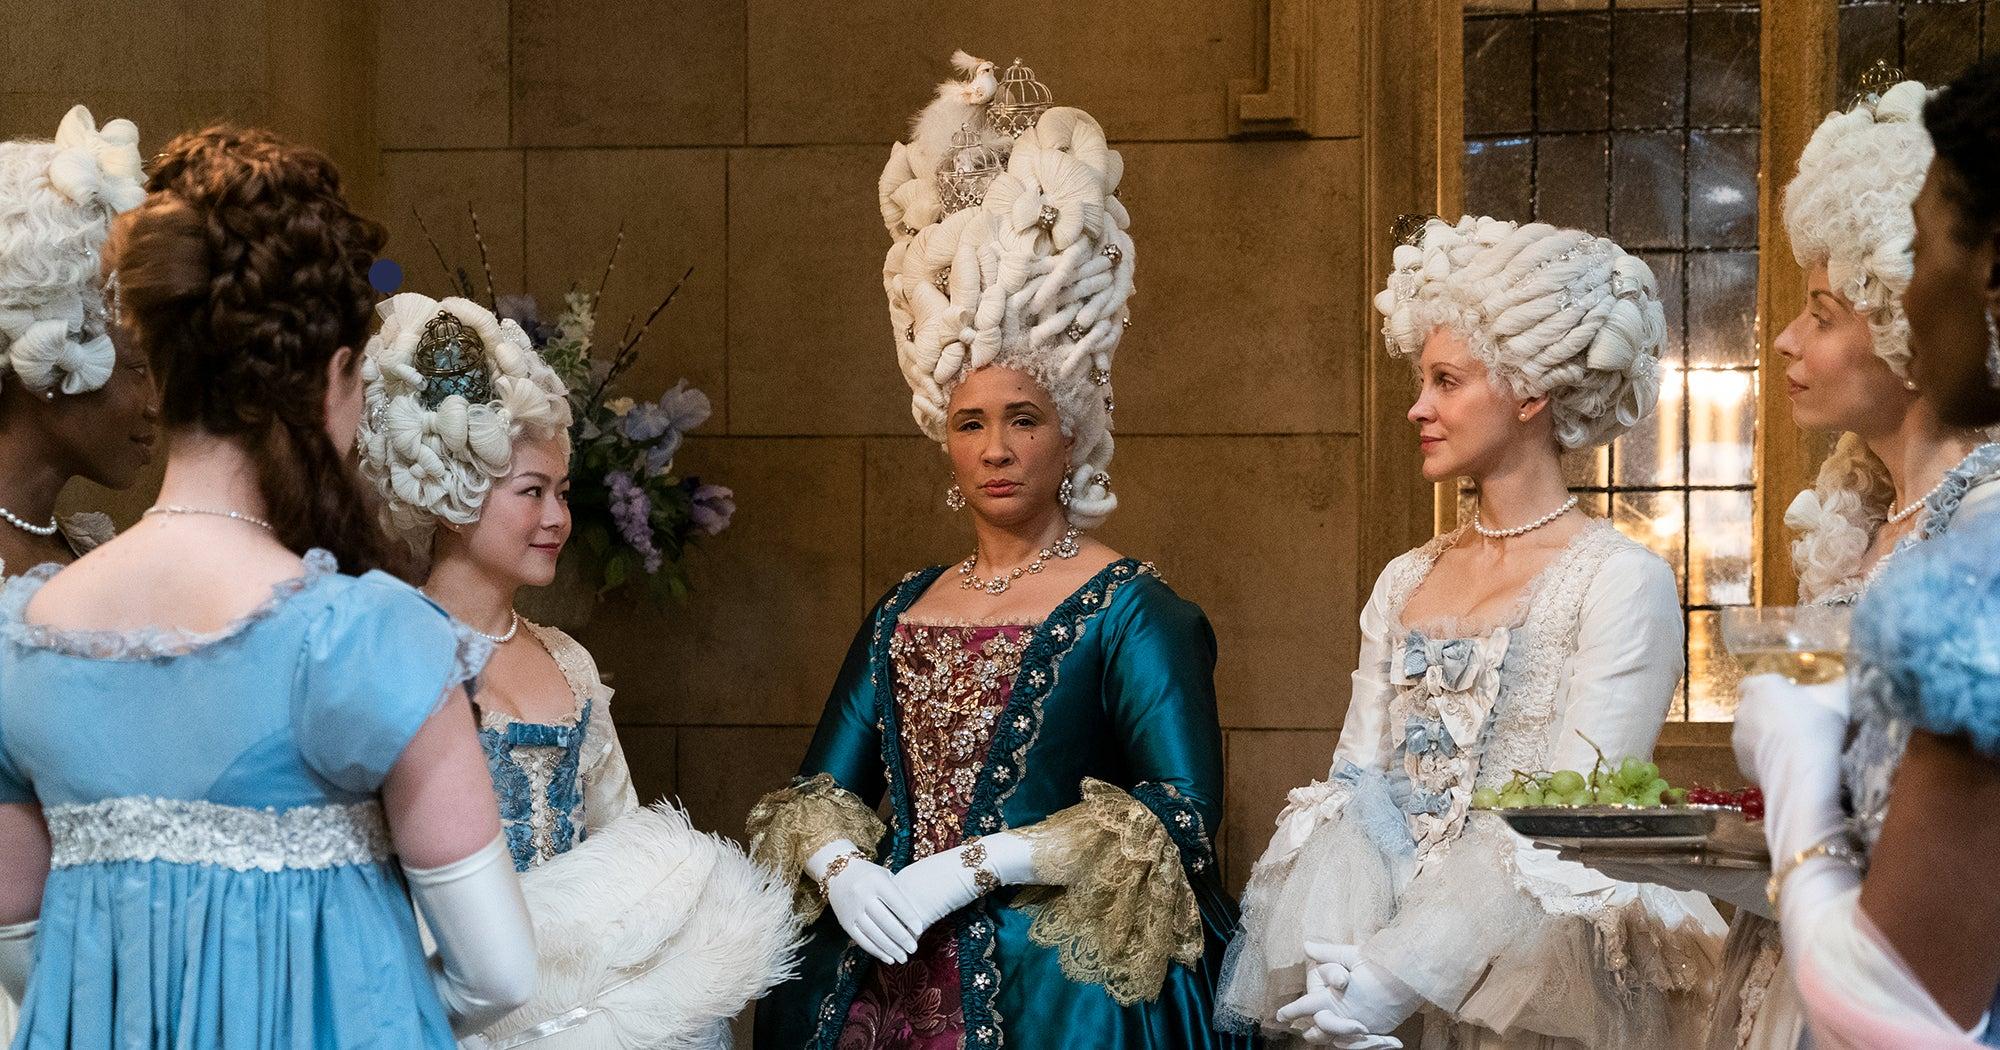 www.refinery29.com: Bridgerton Inspires 2021 Regencycore Fashion Trend